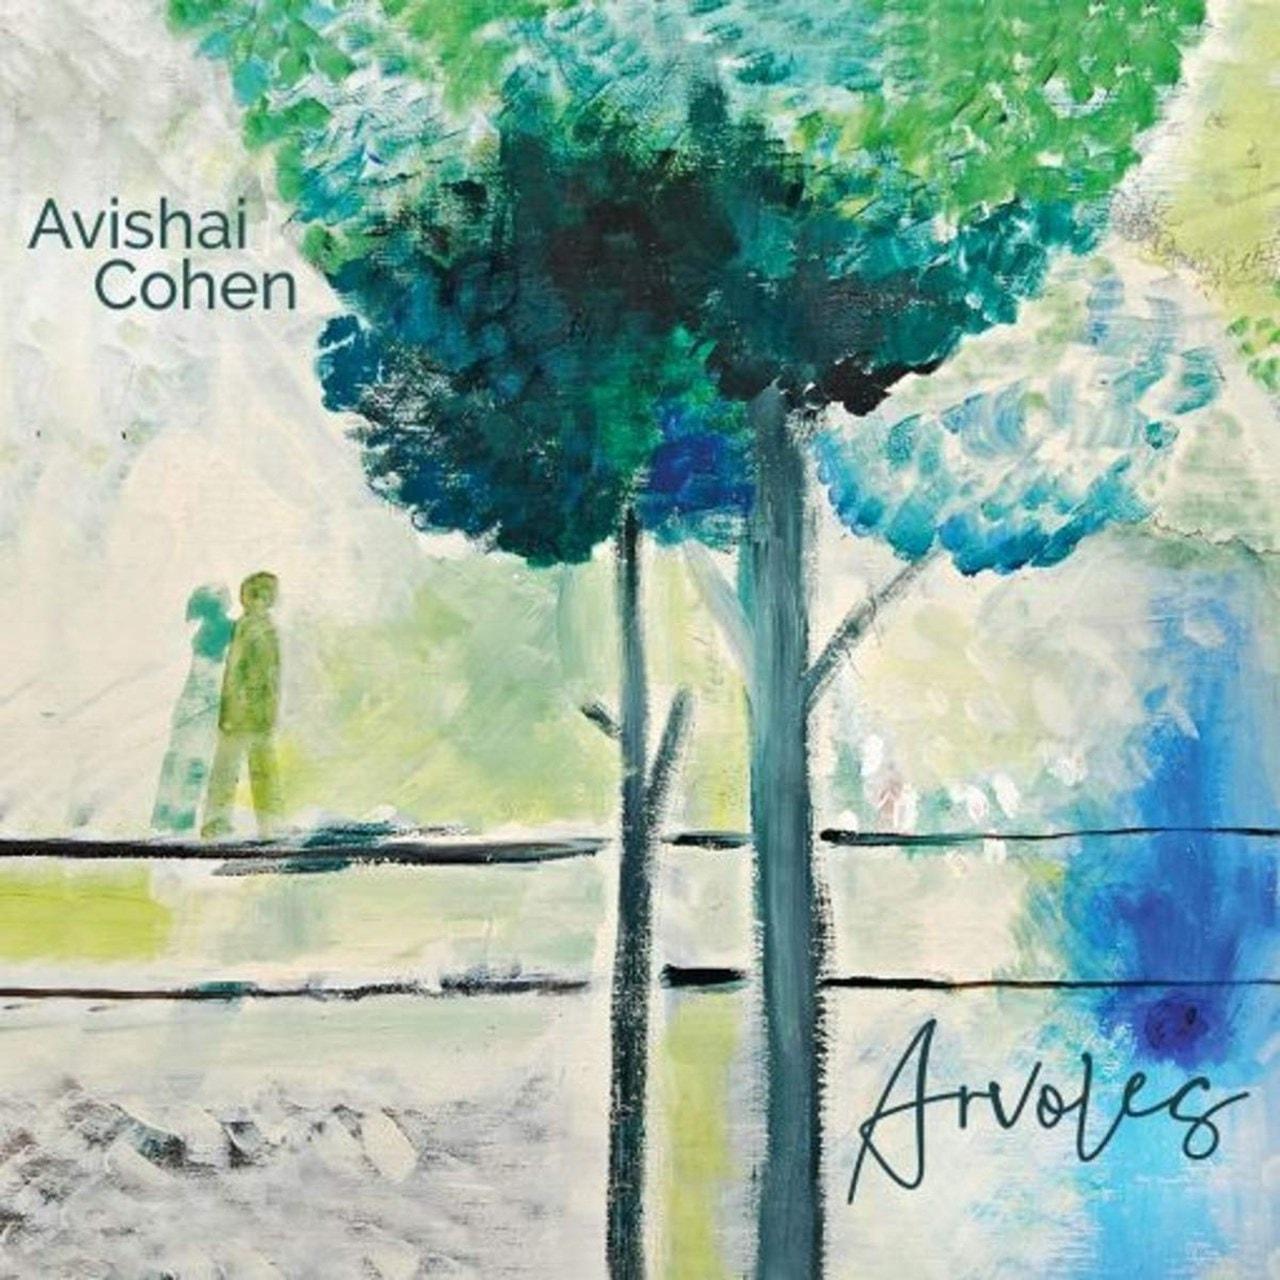 Arvoles - 1